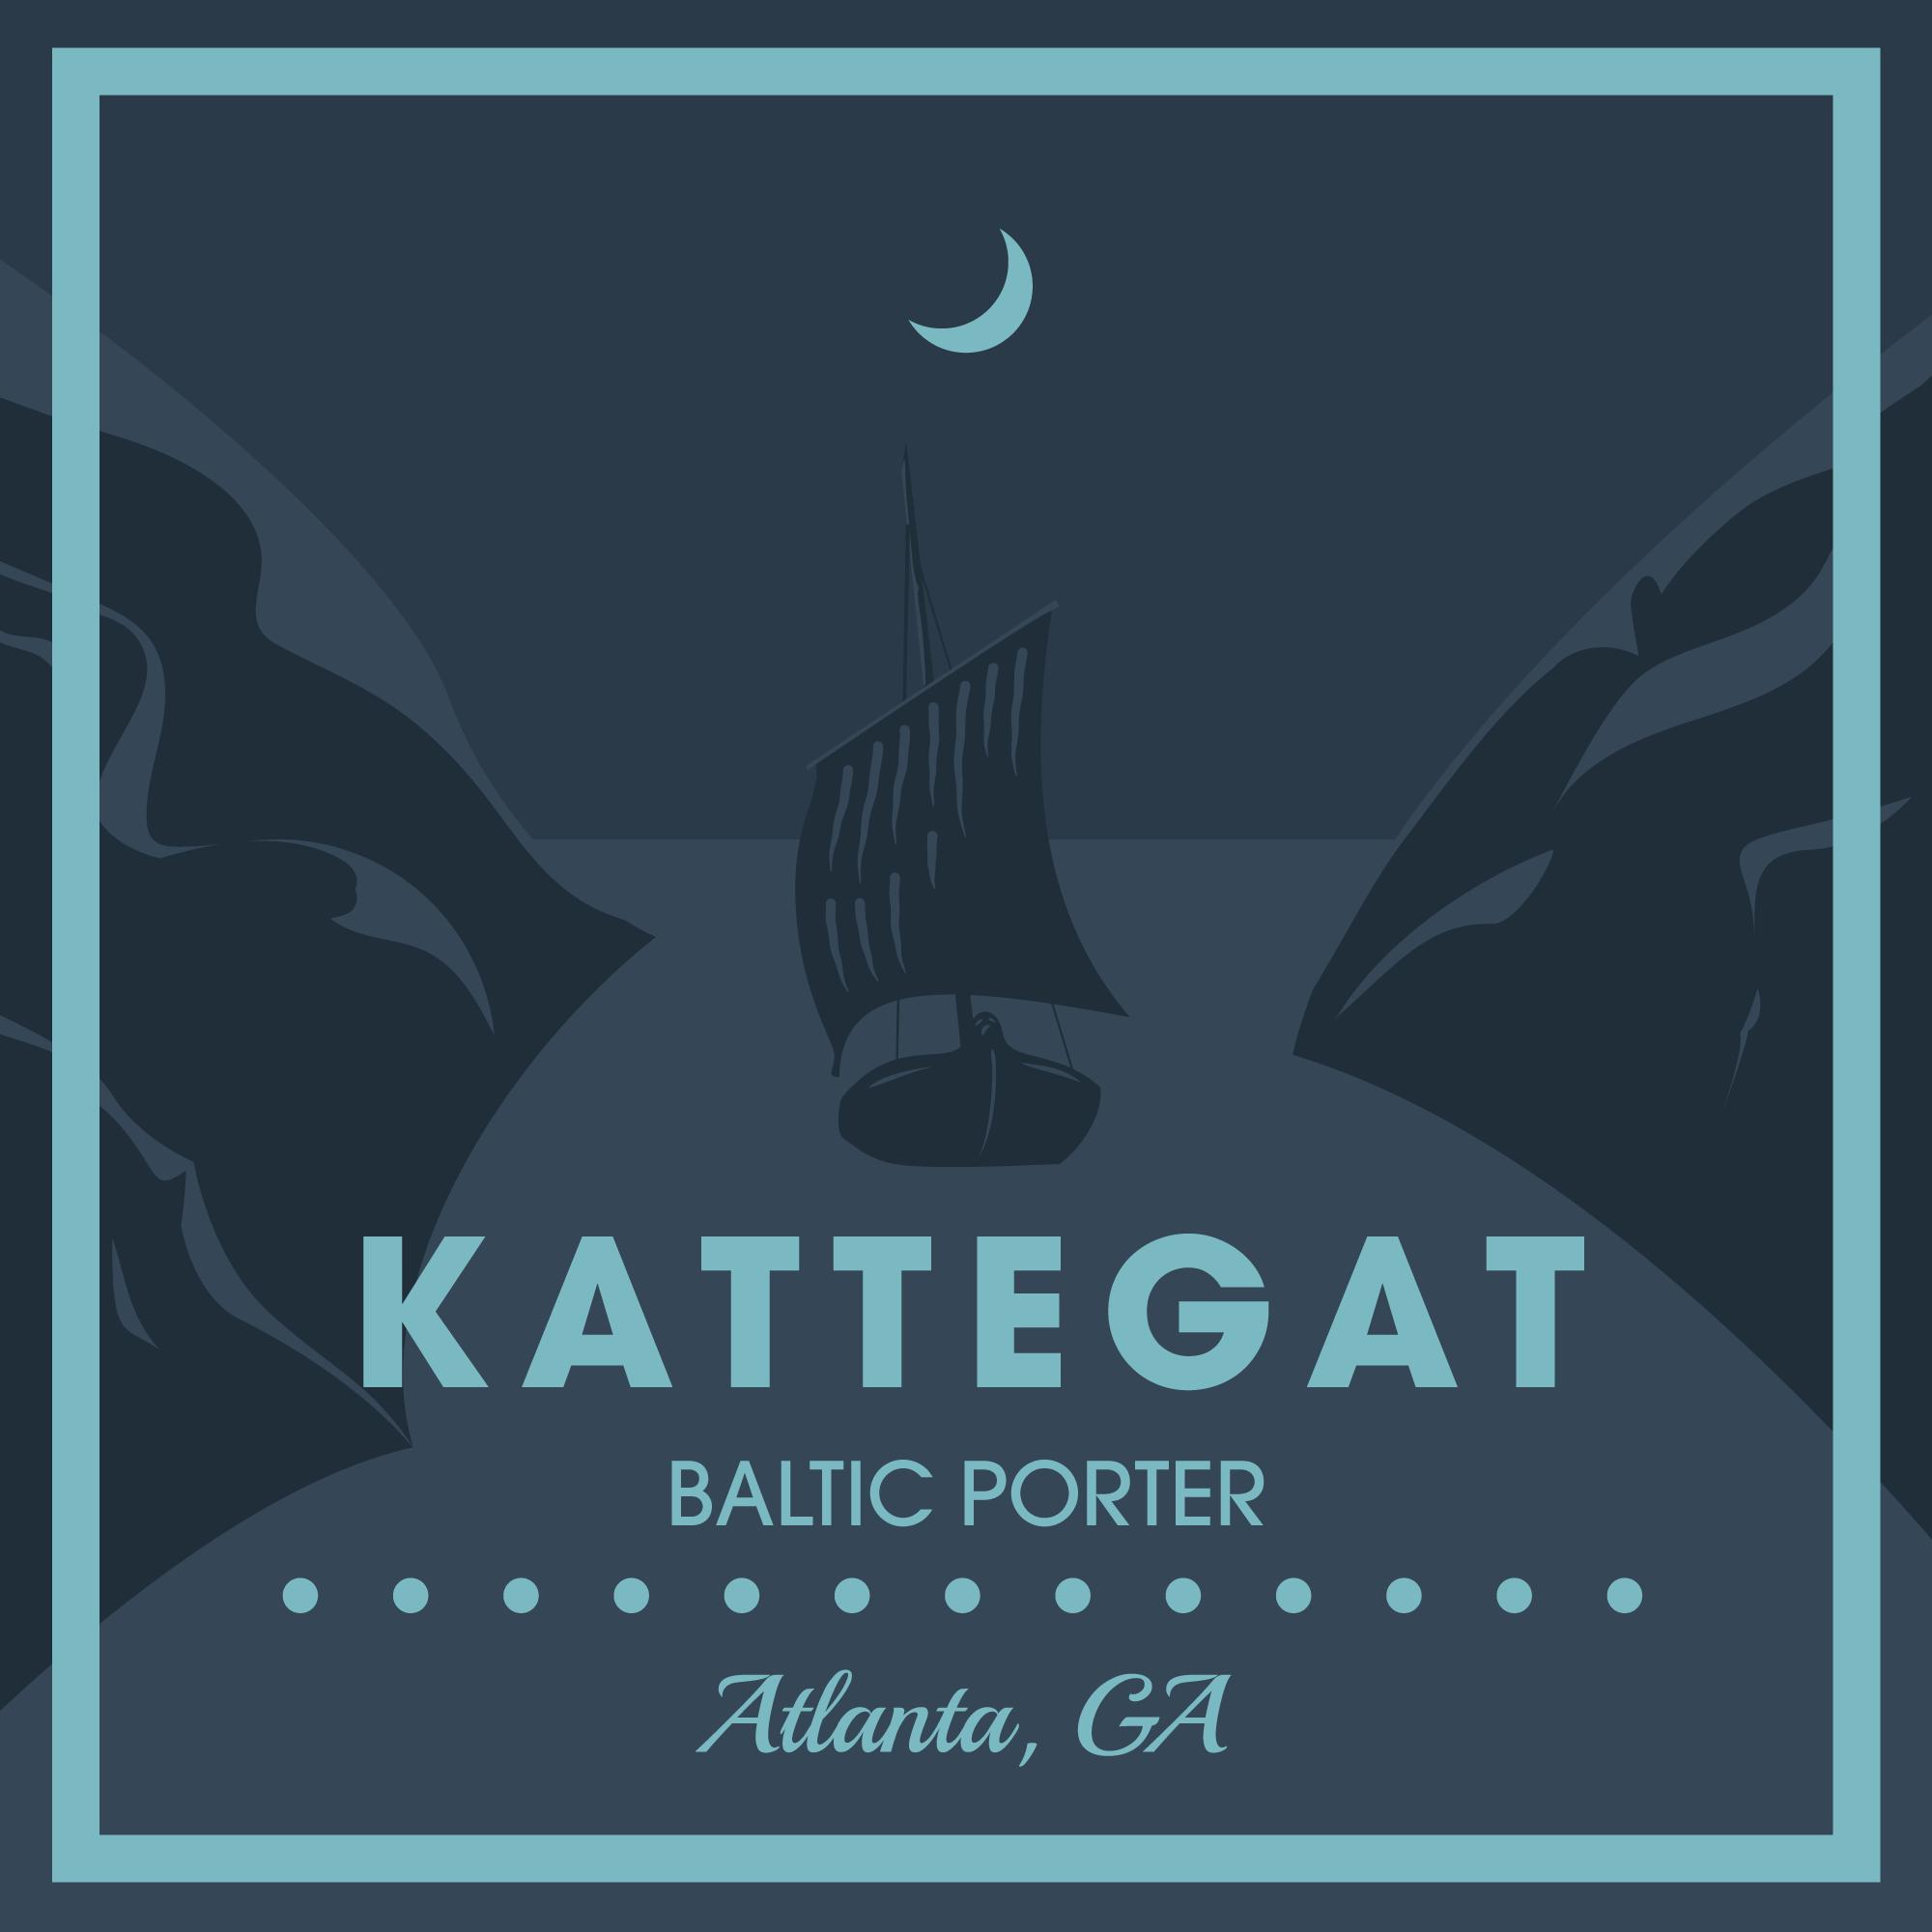 Kattegat Baltic Porter